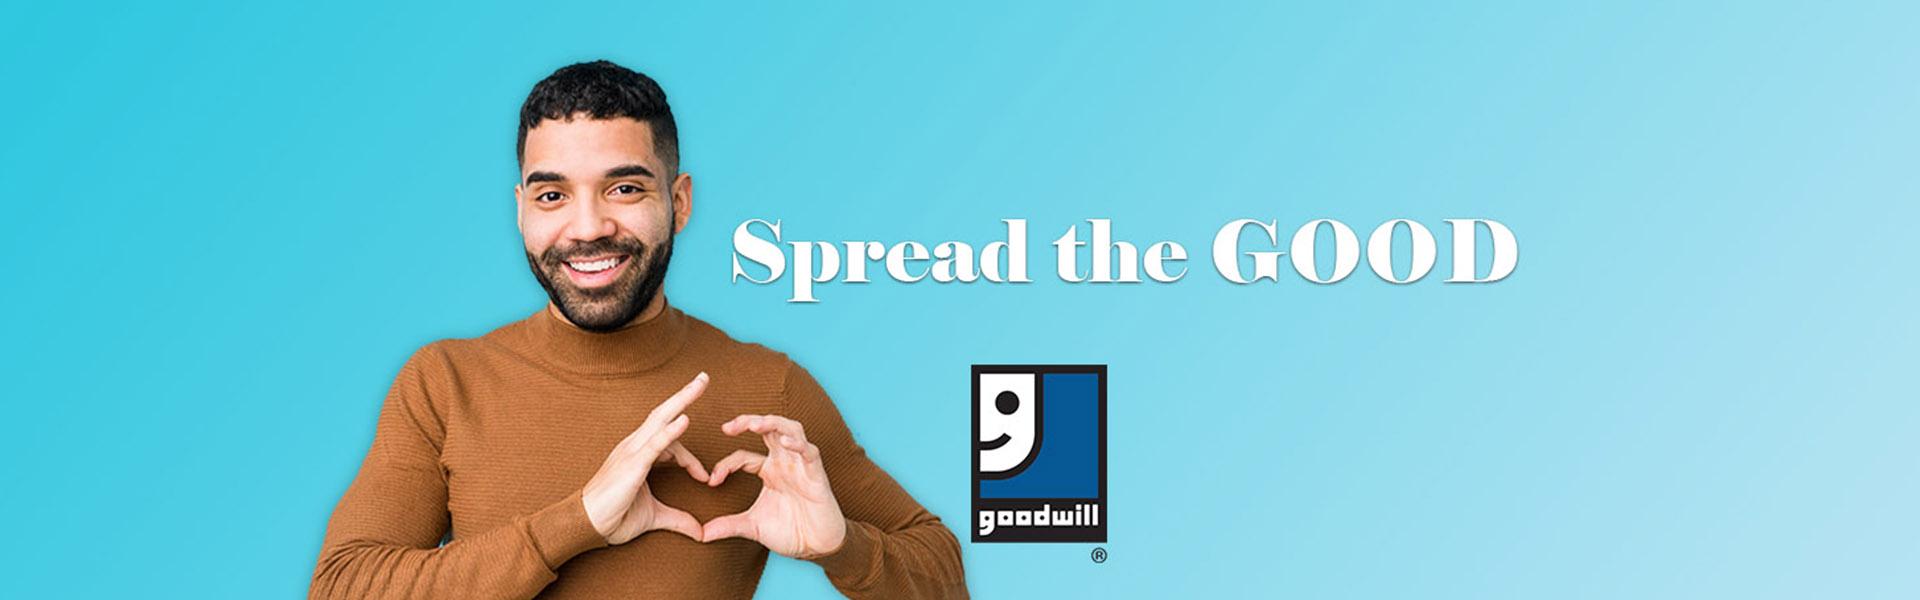 Spread the GOOD